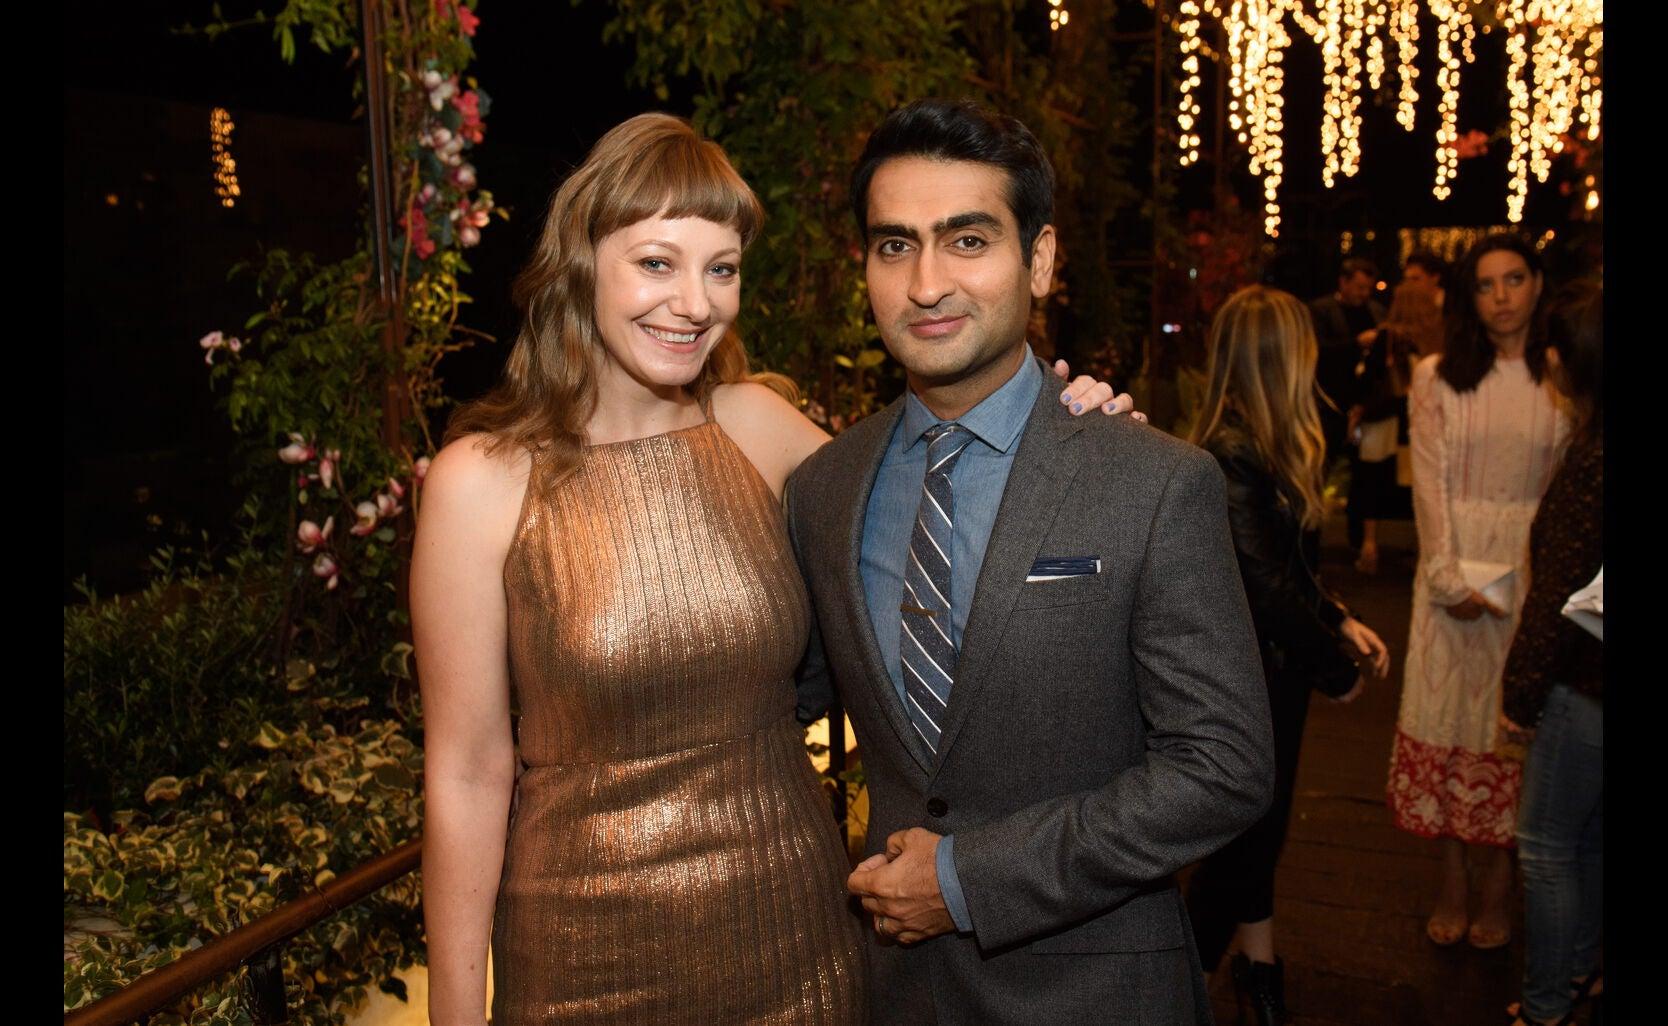 Kumail Nanjiani and Emily Gordon at the Golden Globe Ambassador 2018 event